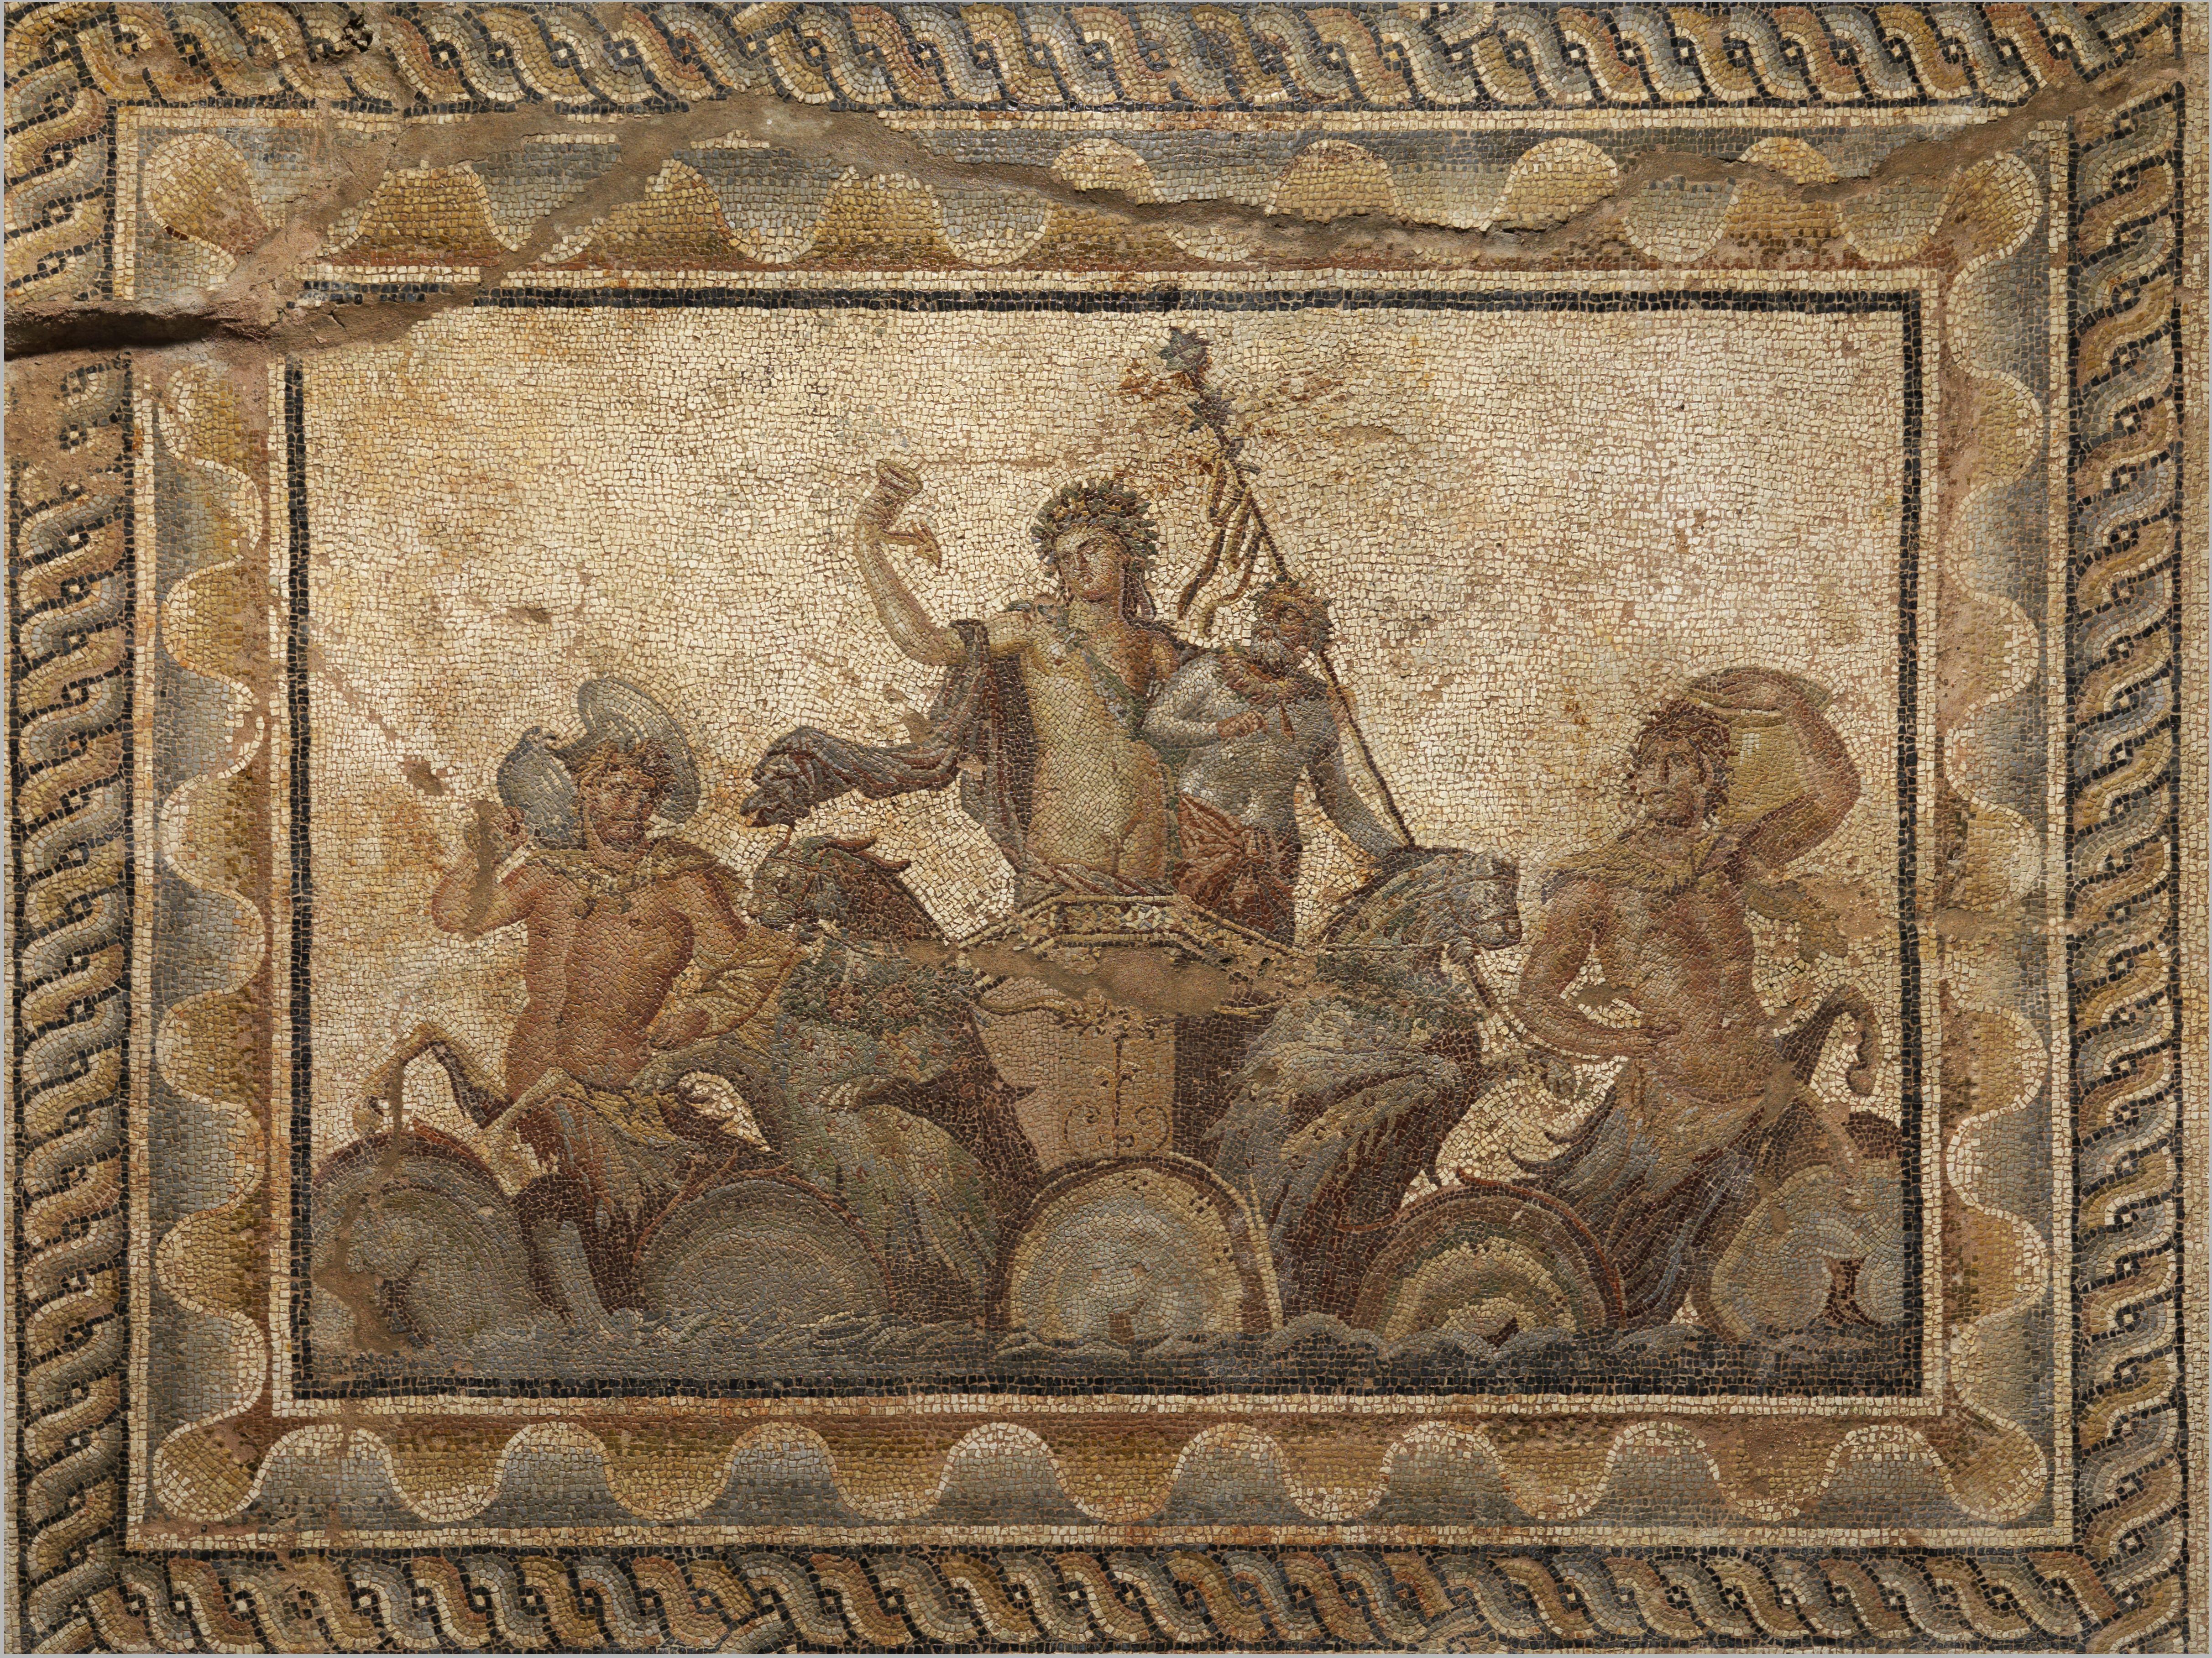 the art of ancient dion u2013 ancient history et cetera